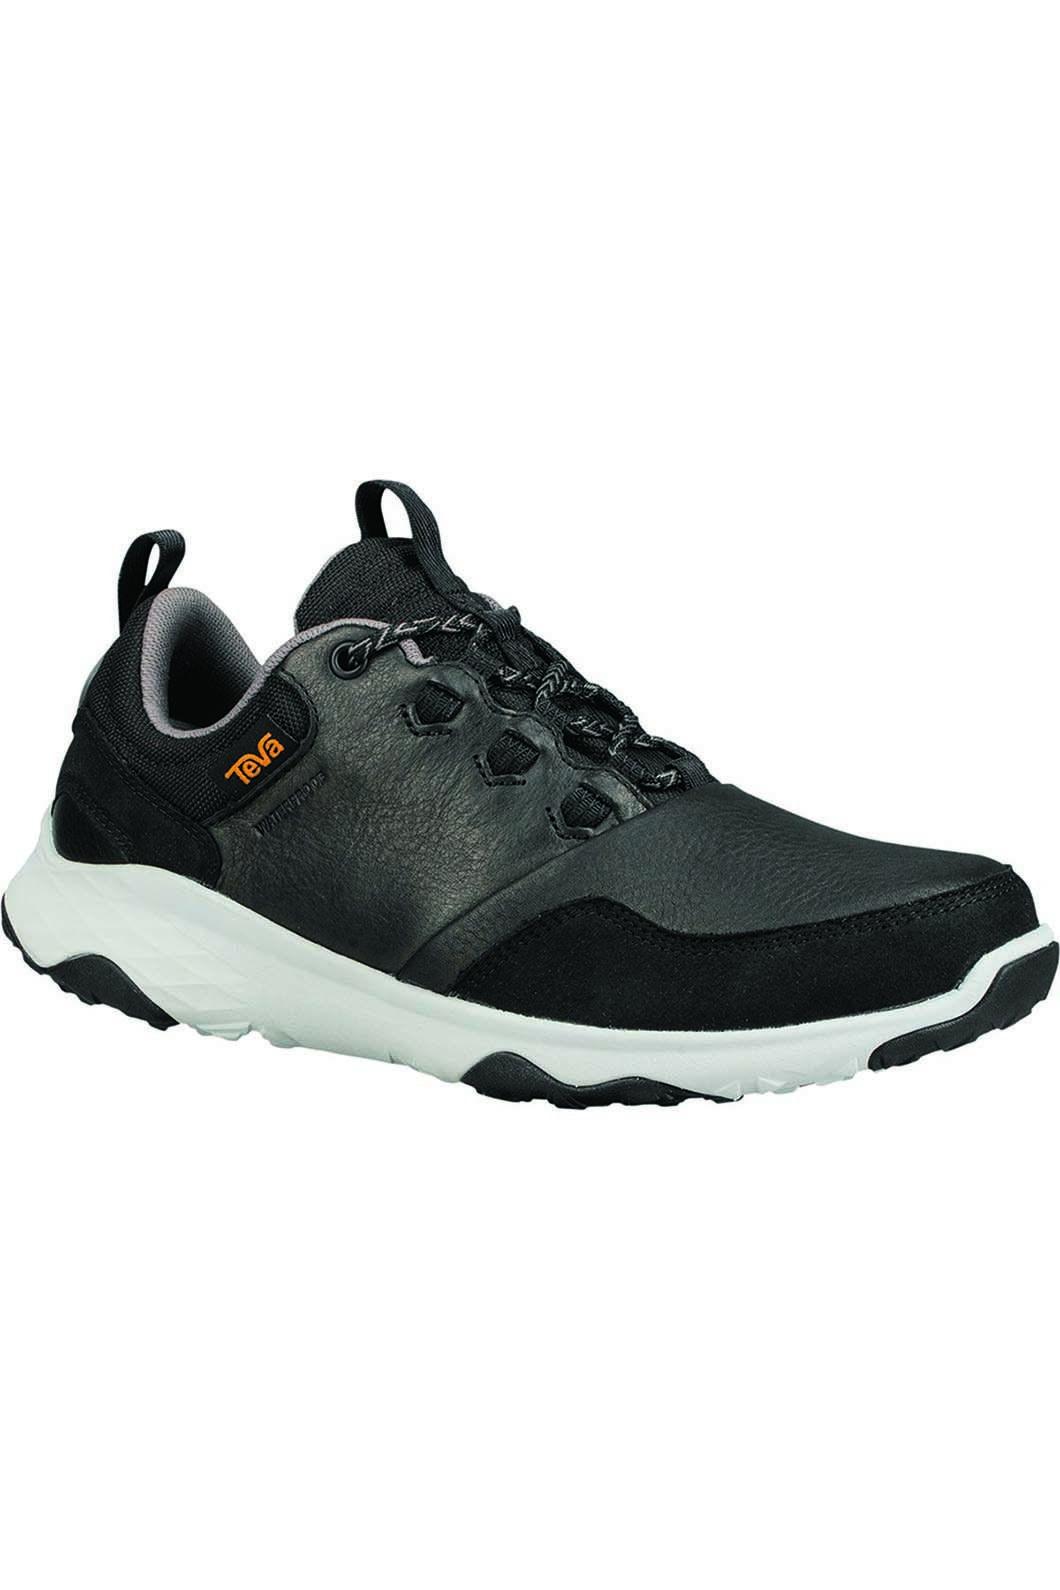 Teva Men's Arrowood 2 Casual Shoes Tortoiseshell, Black, hi-res